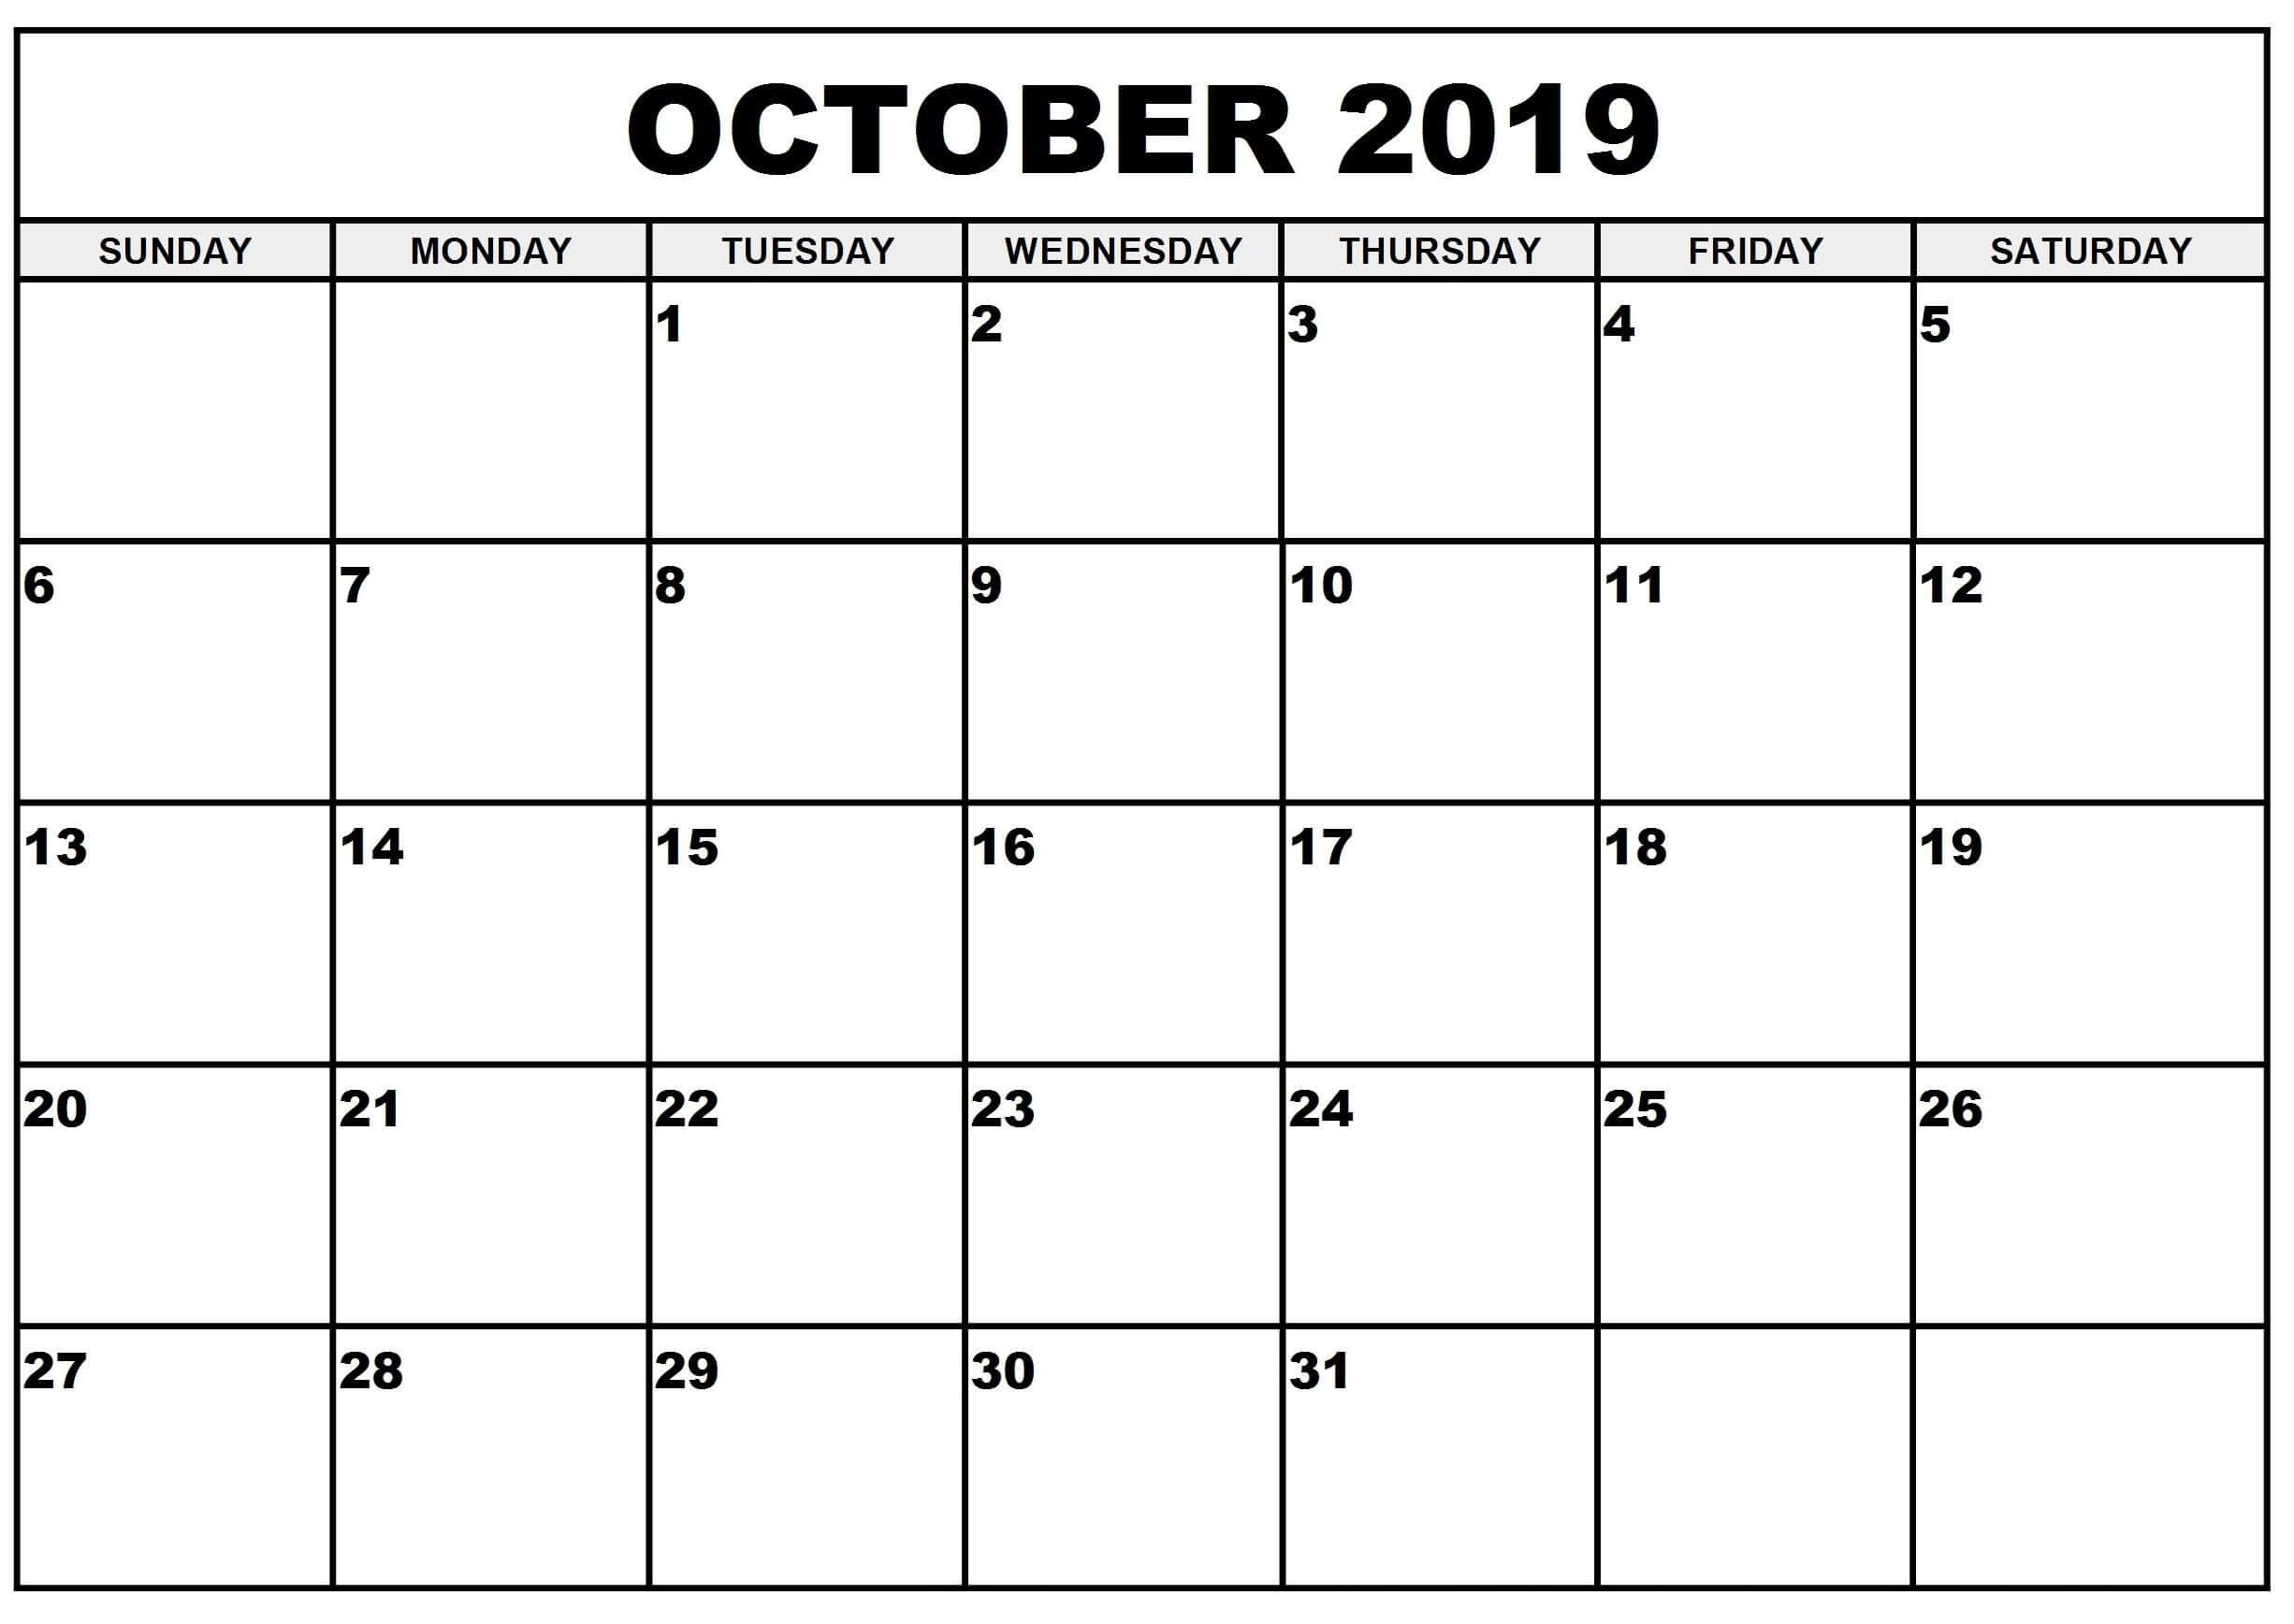 Printable October 2019 Calendar Australia With Holidays | Free with Calendar October 2019 Australia Images